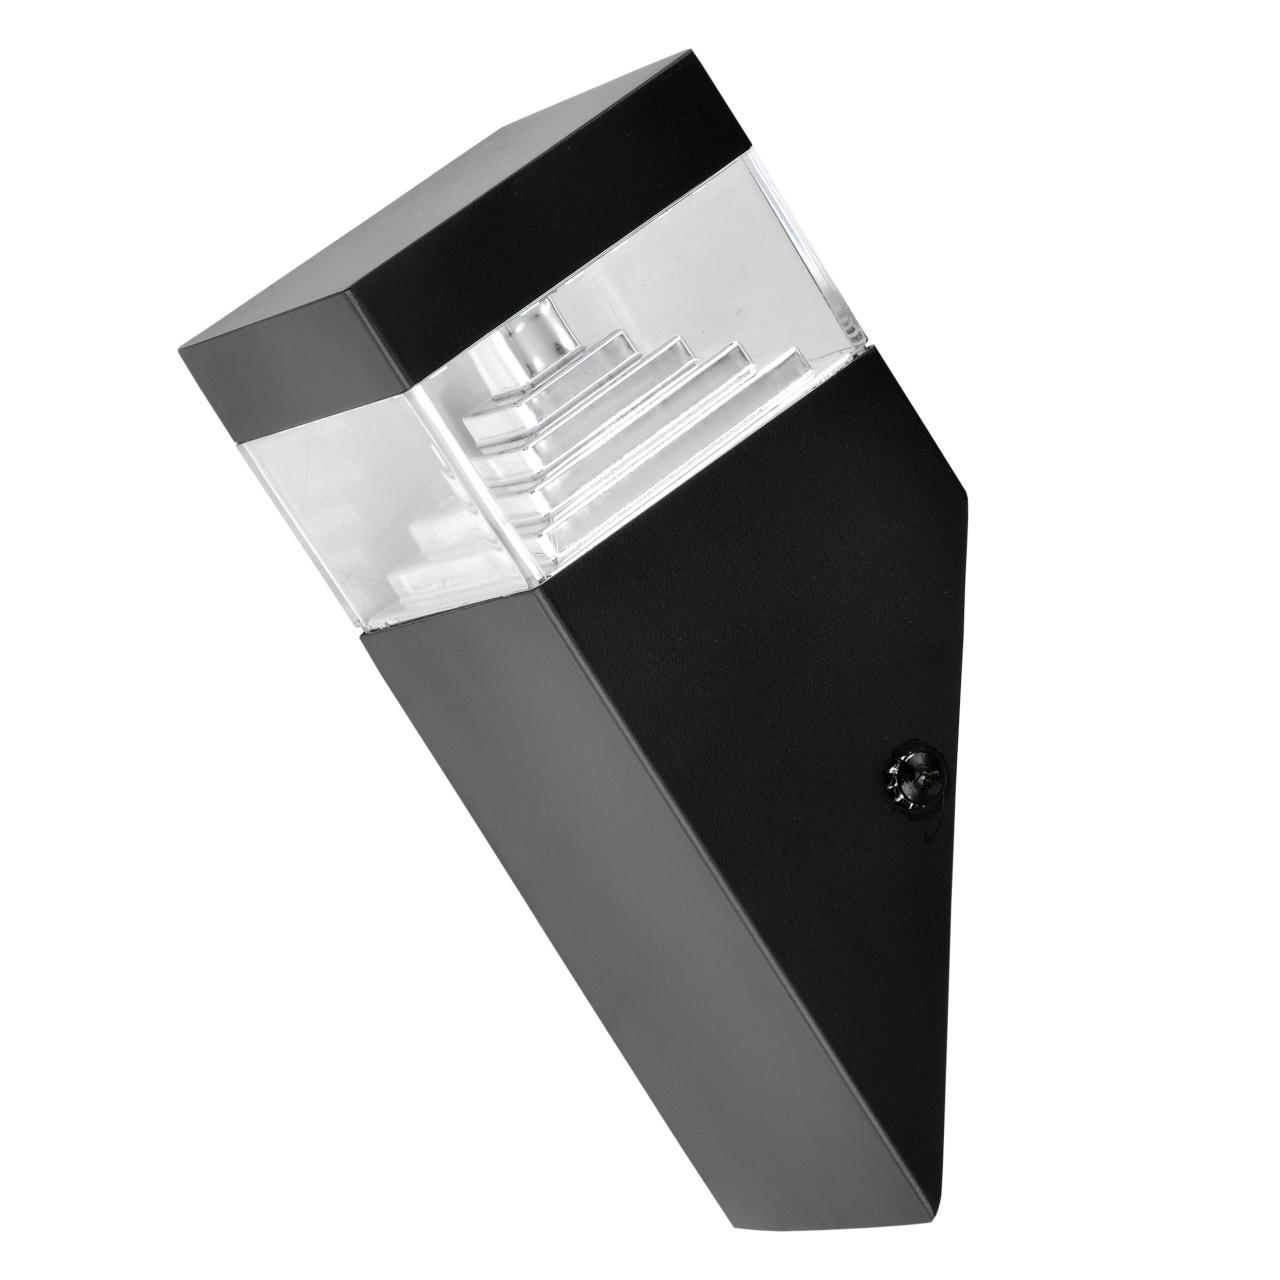 Светильник Raggio LED 6W 300LM черный 4000K IP55 Lightstar 377607